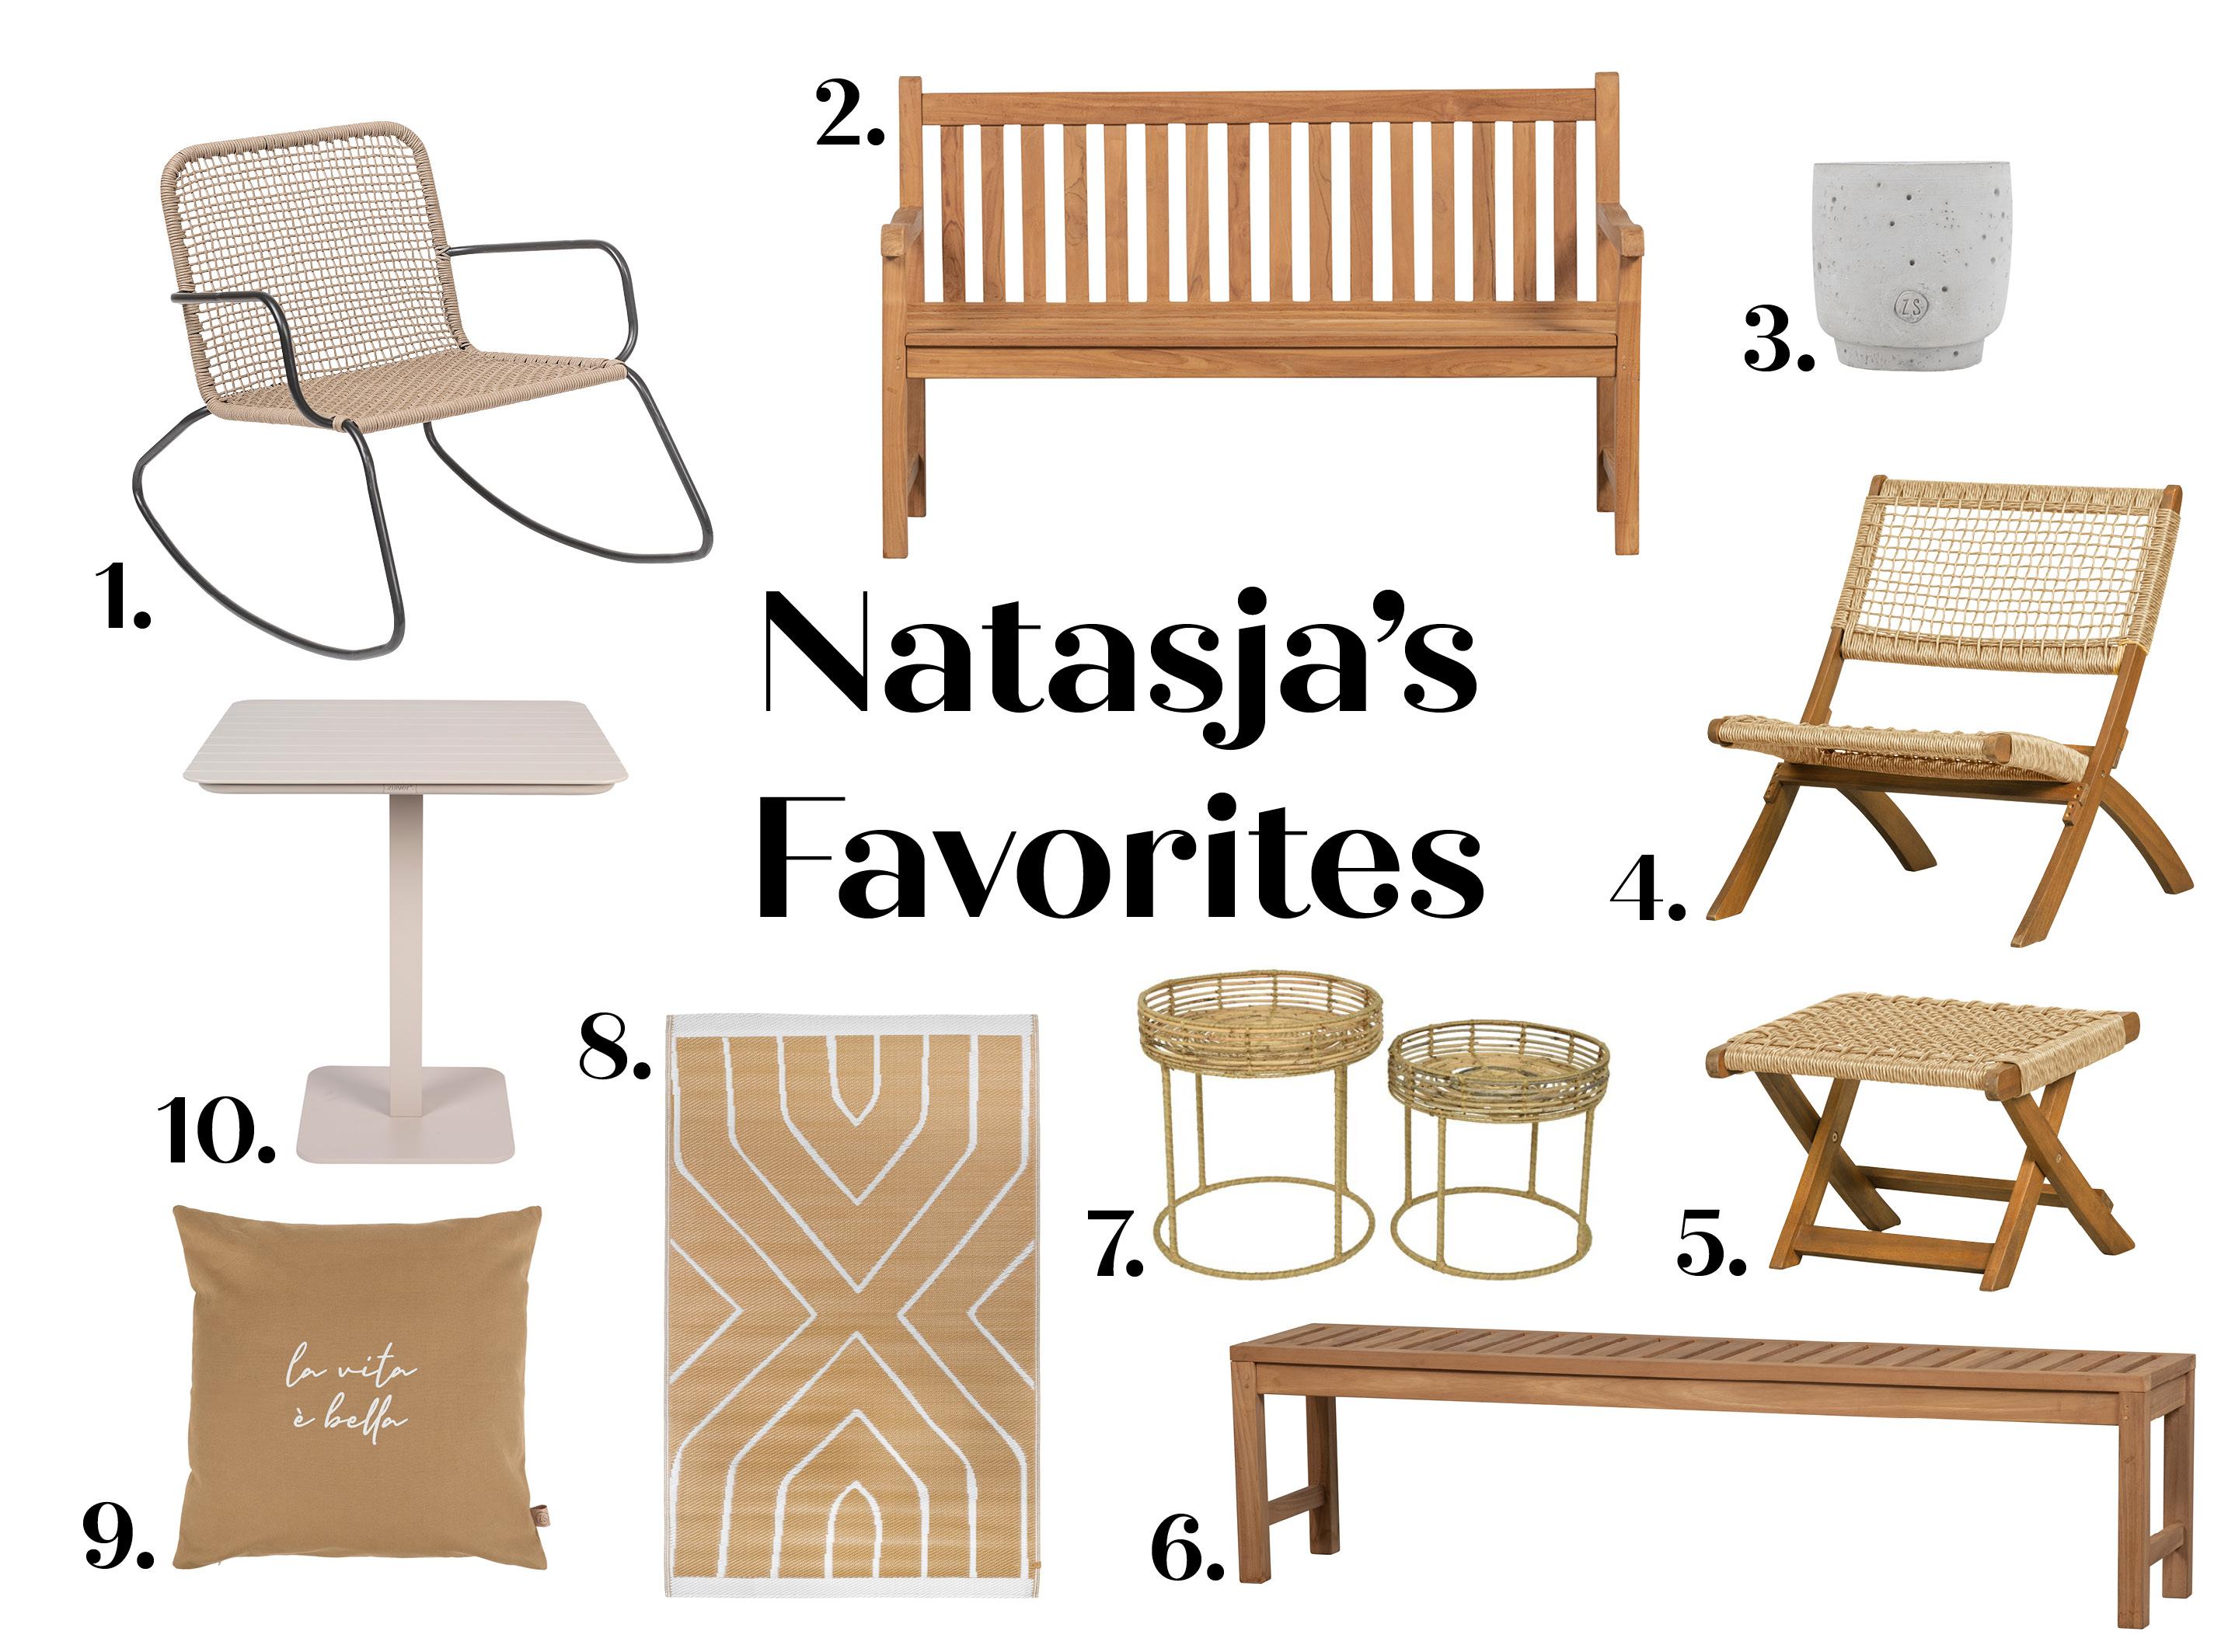 3 luik Natasja's favorites